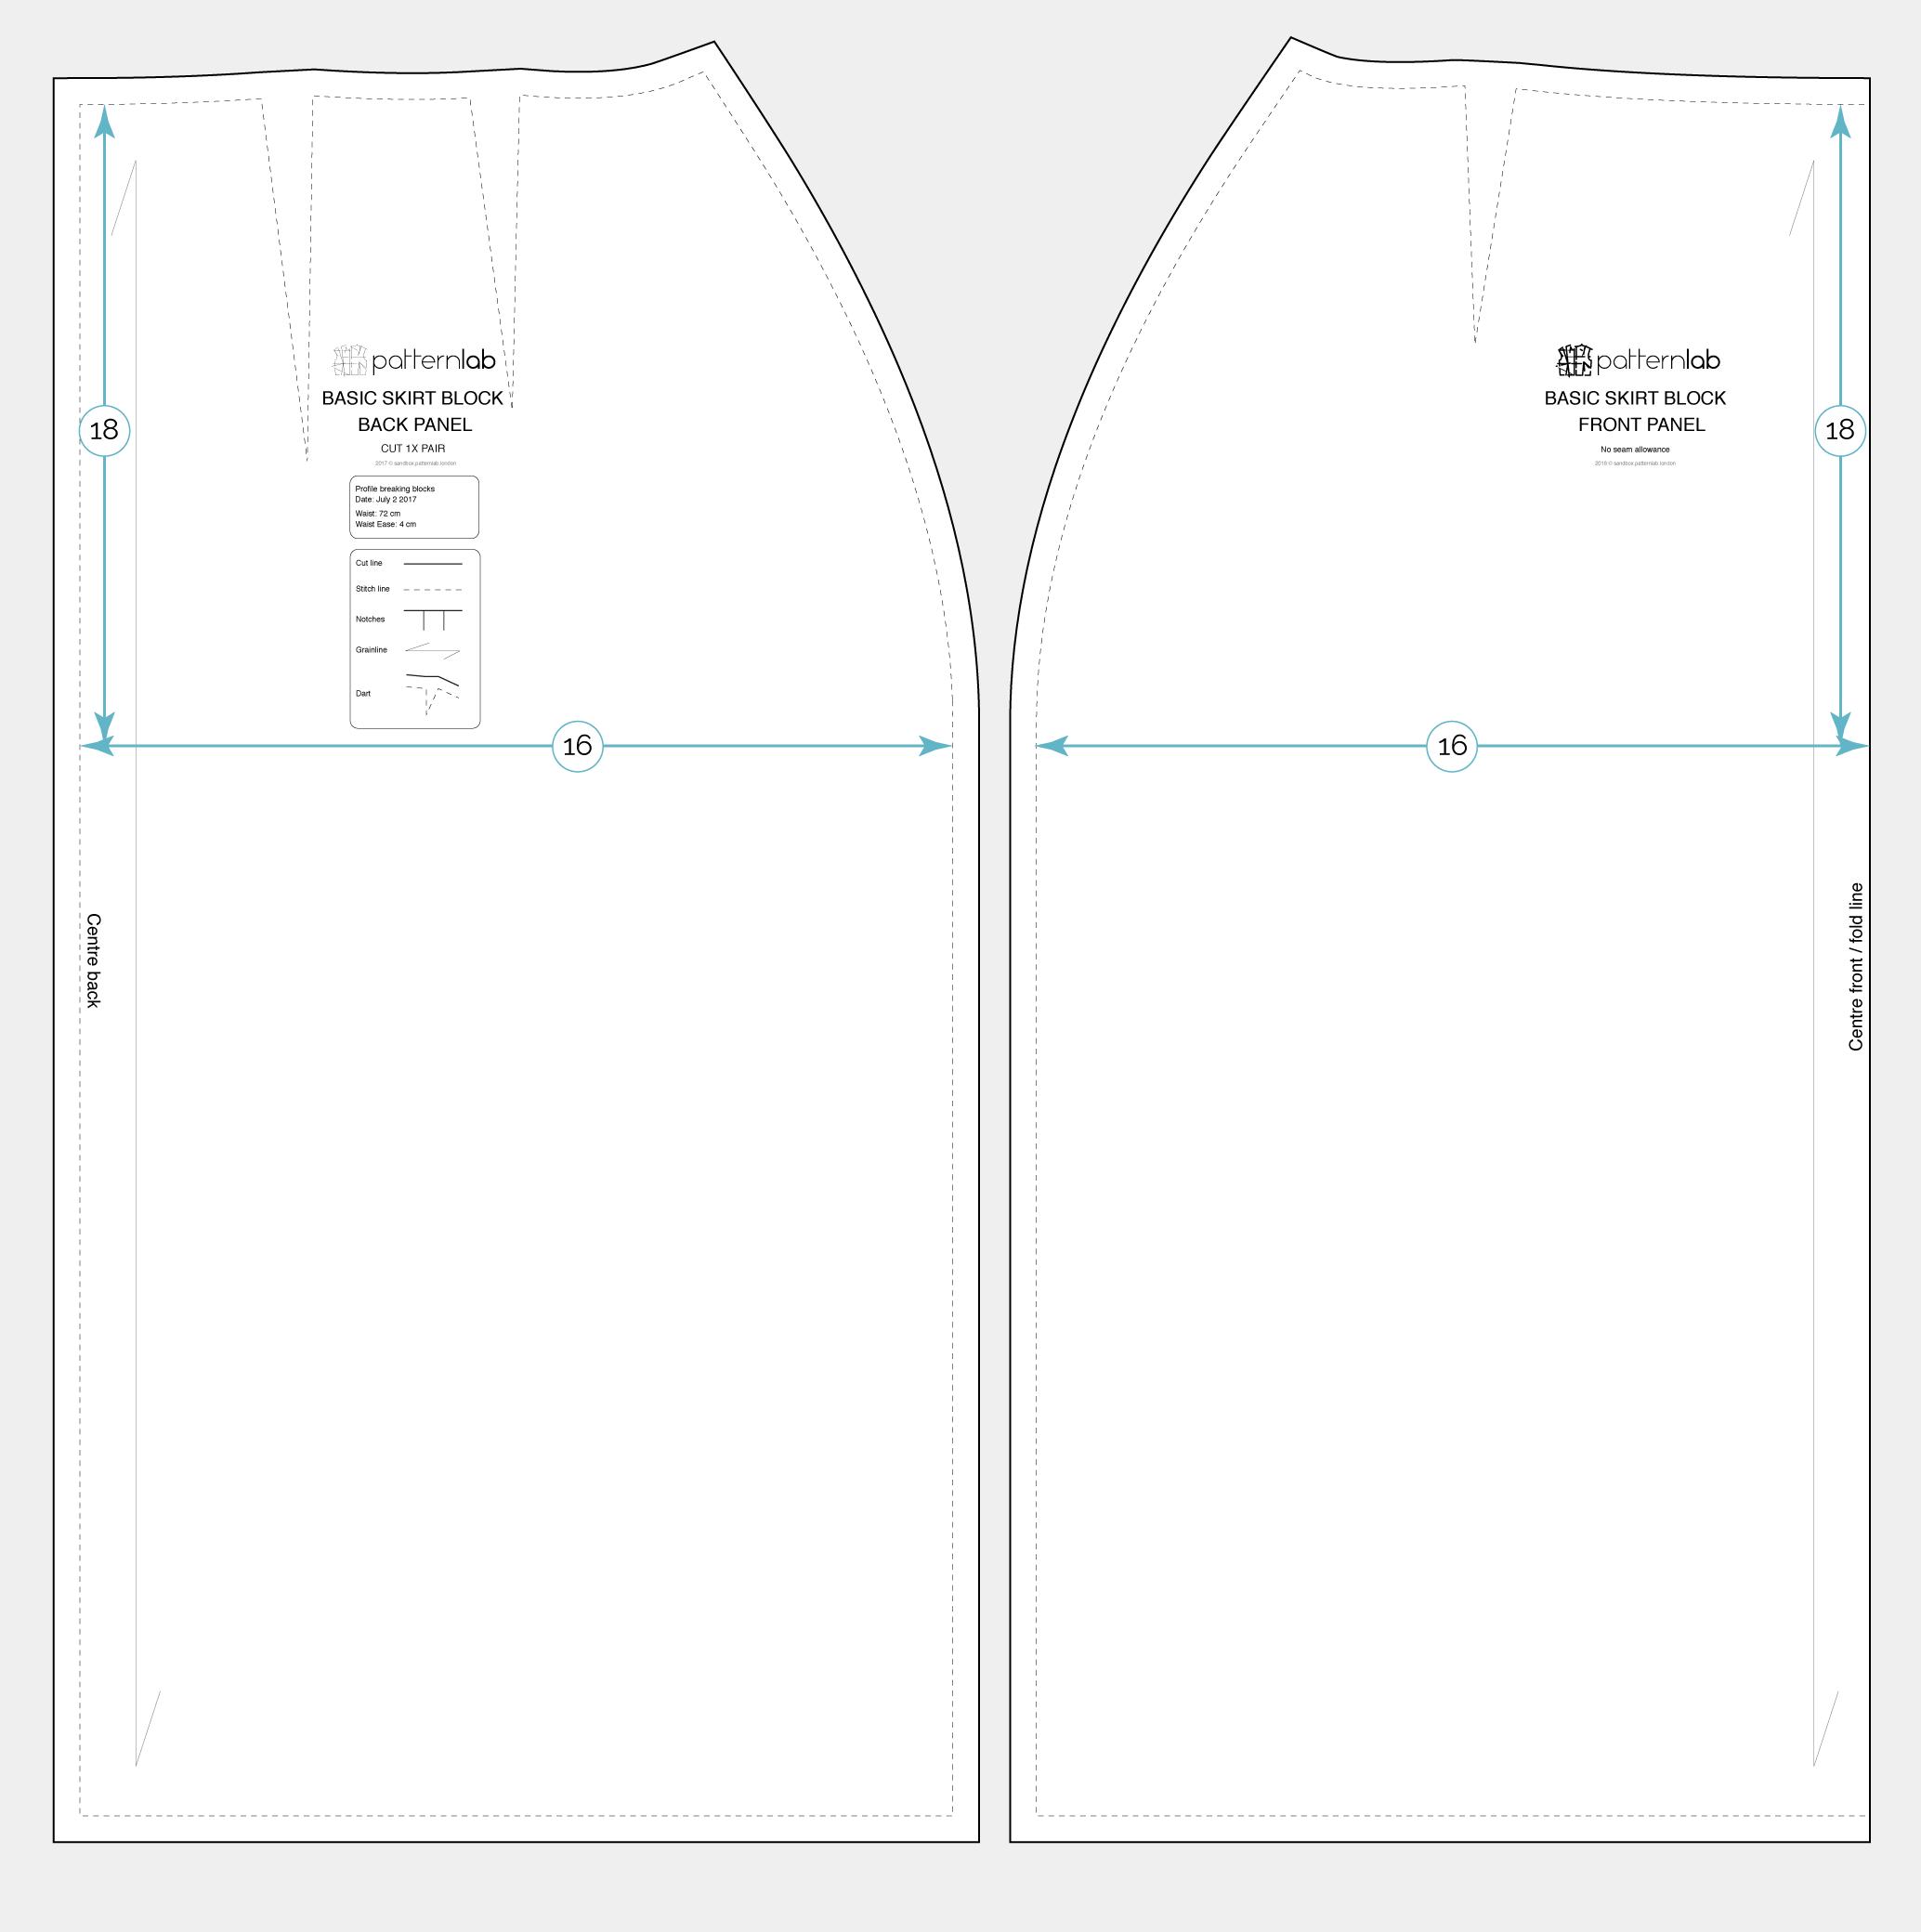 Basic skirt block - Patternlab